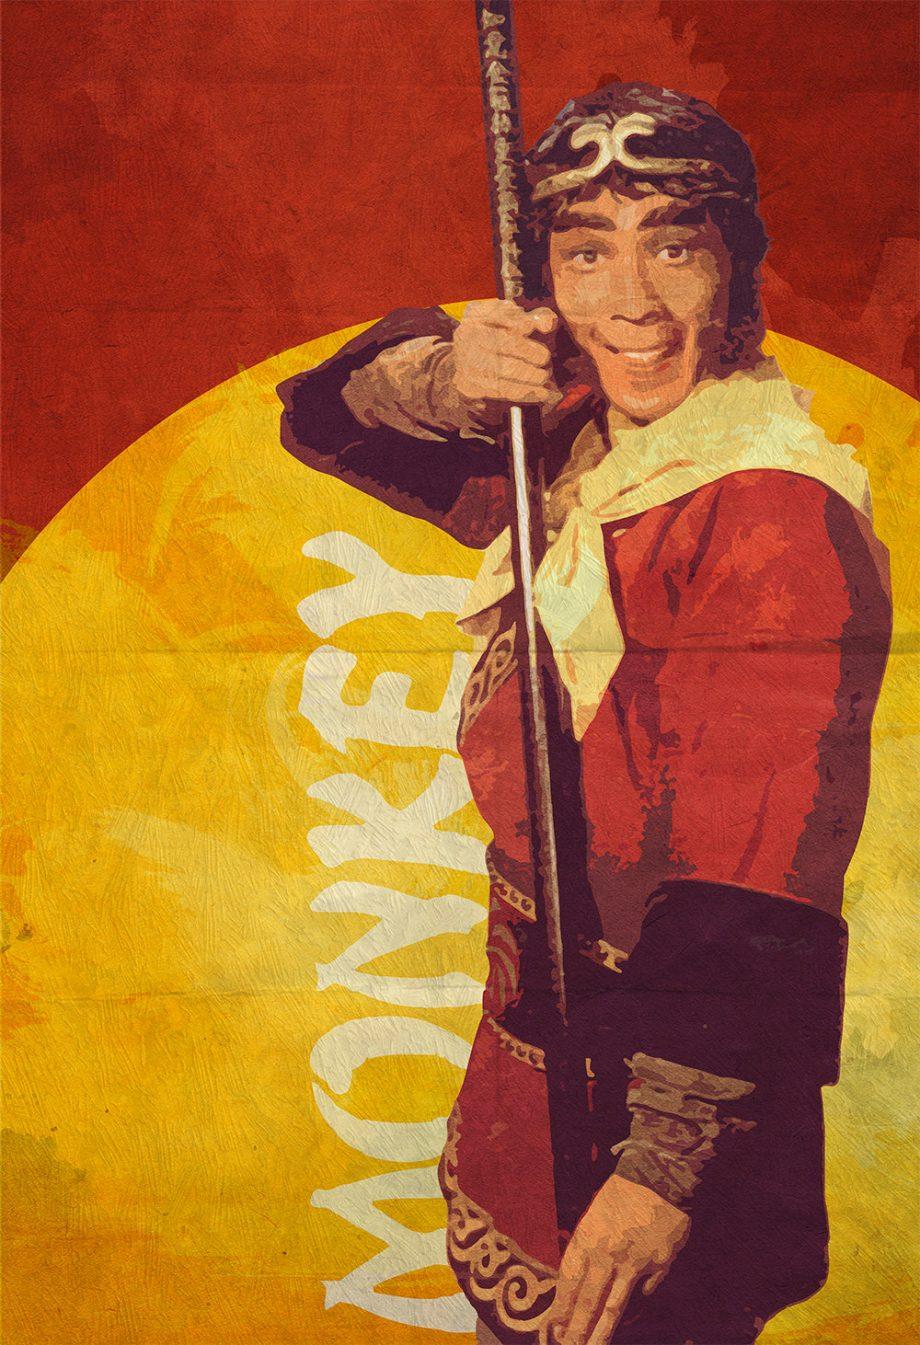 Monkey Magic Print Saiyuki Cult Retro Japanese TV Show Monkey Poster Shenmo Fantasy Pigsy Sandy on Cotton Canvas and Paper Canvas